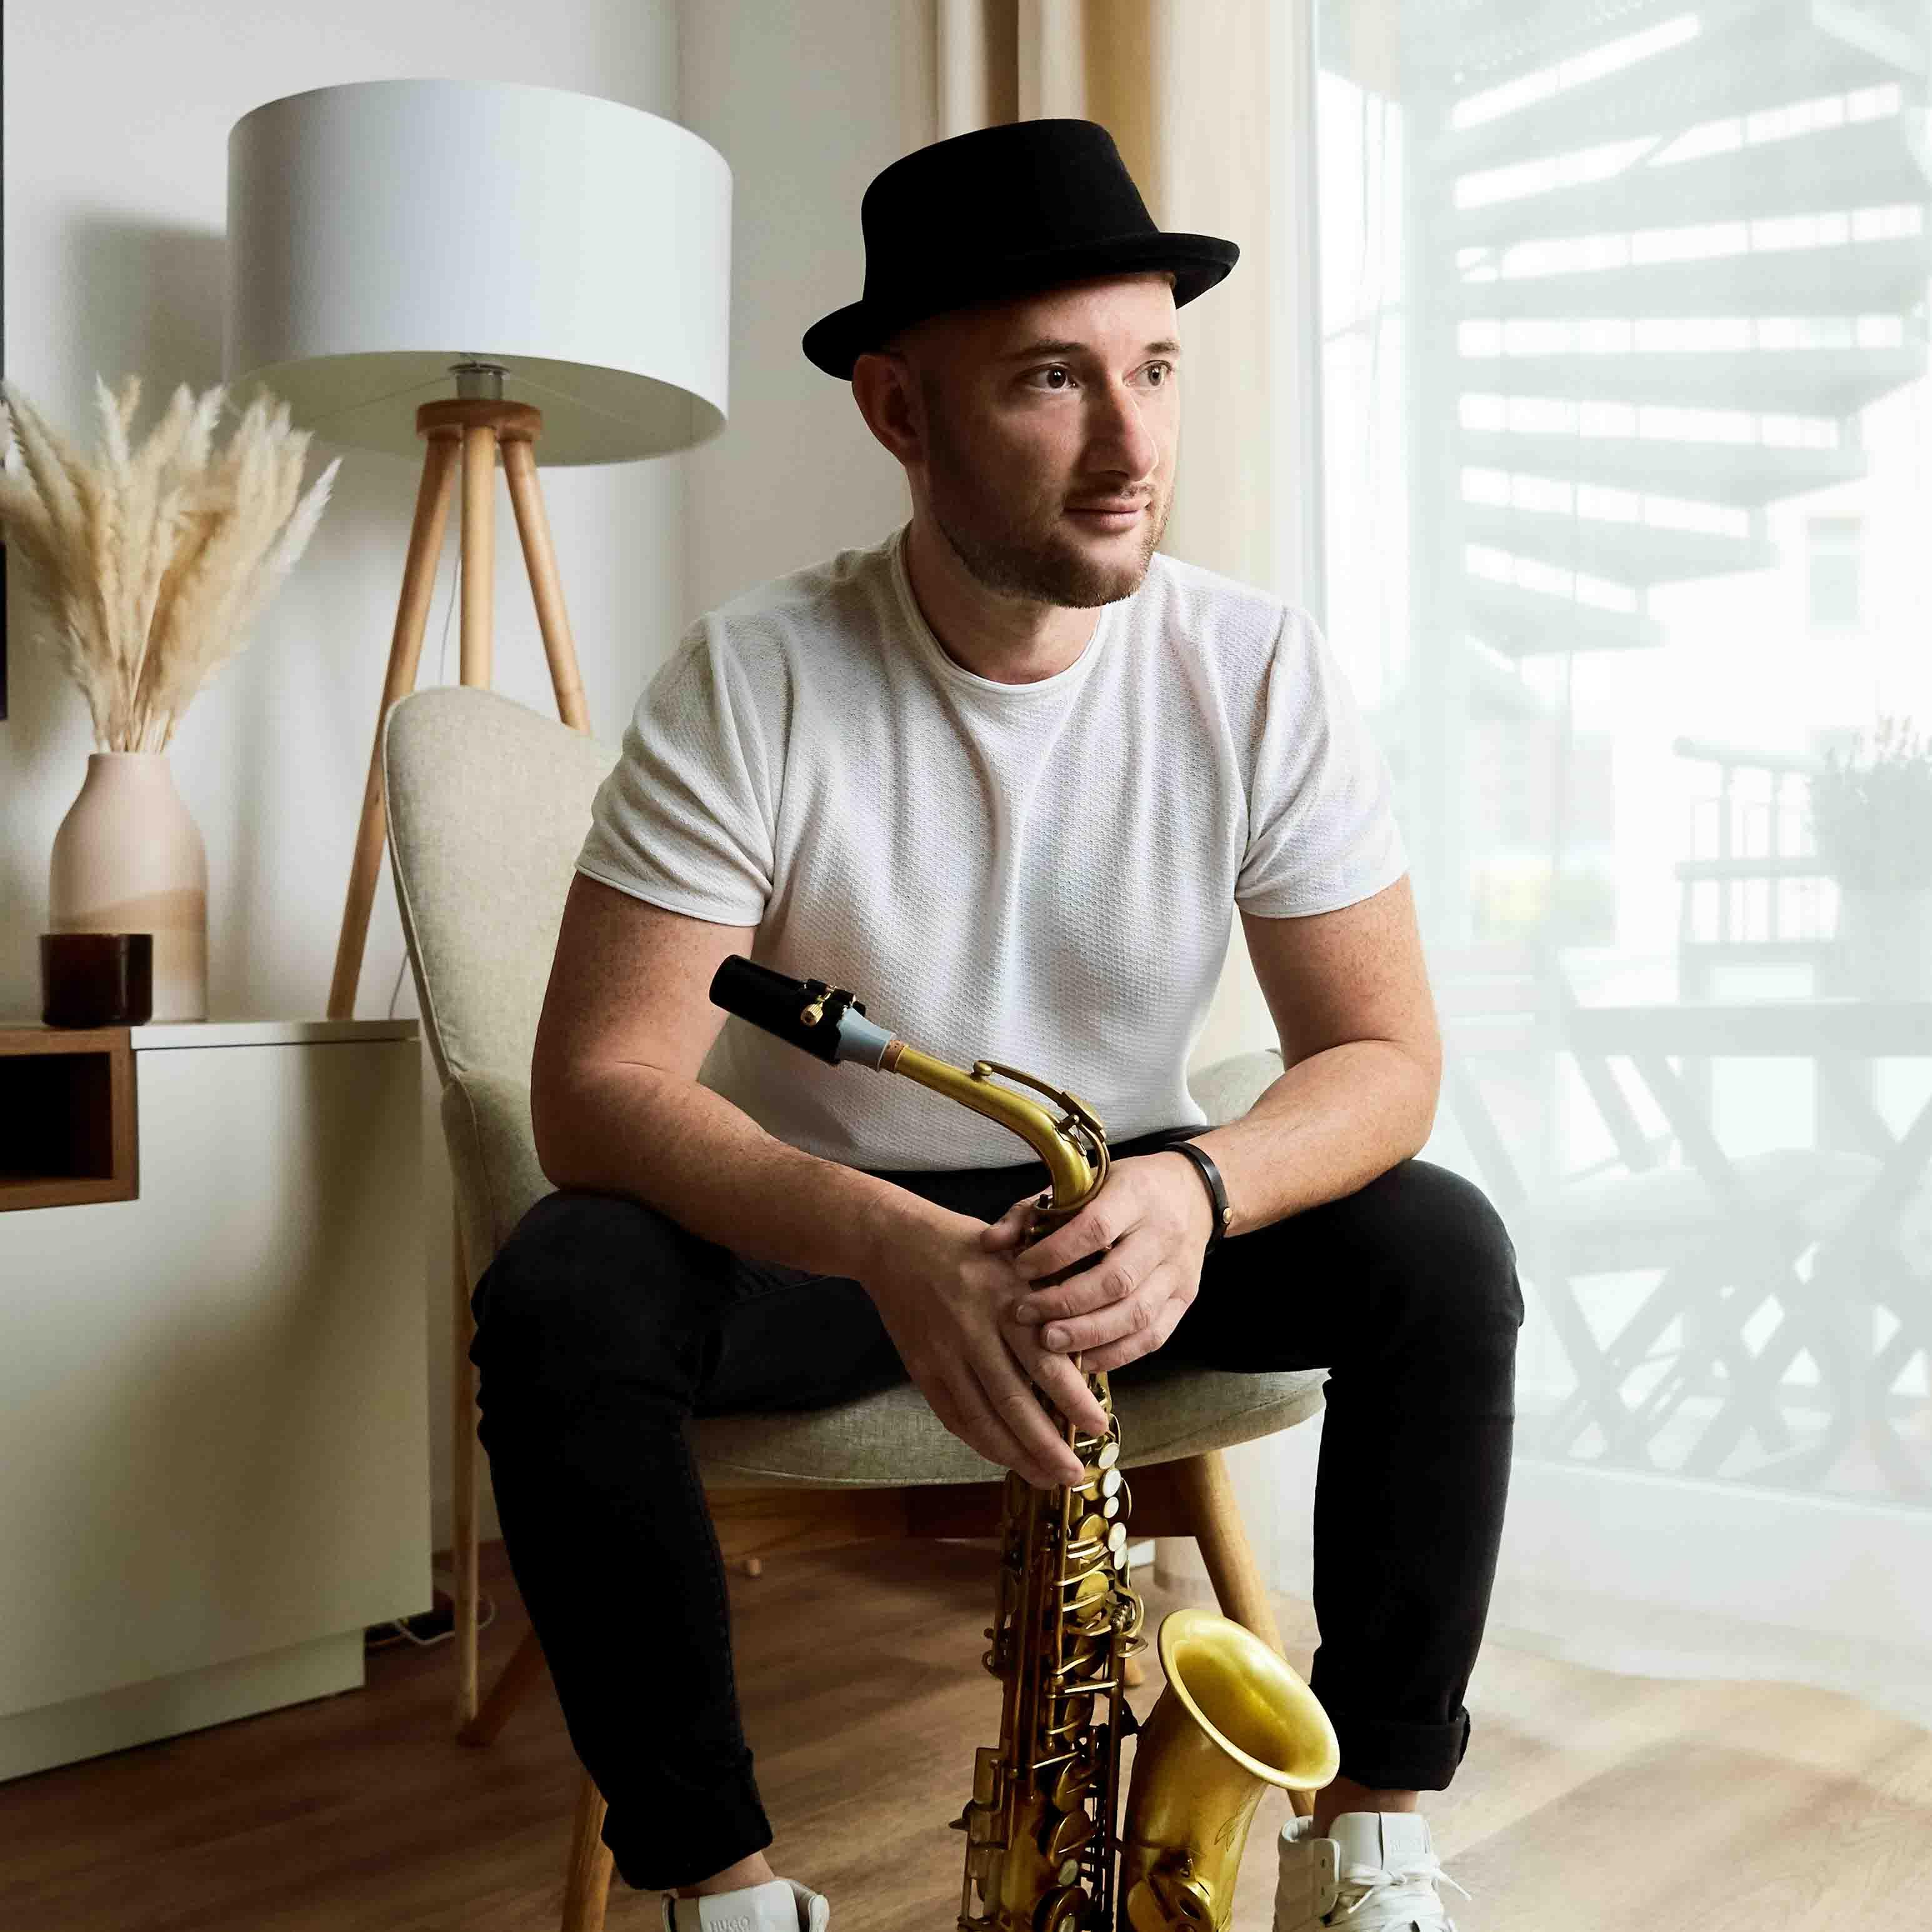 Oleg ROOL Rovner plays a Syos custom saxophone mouthpiece